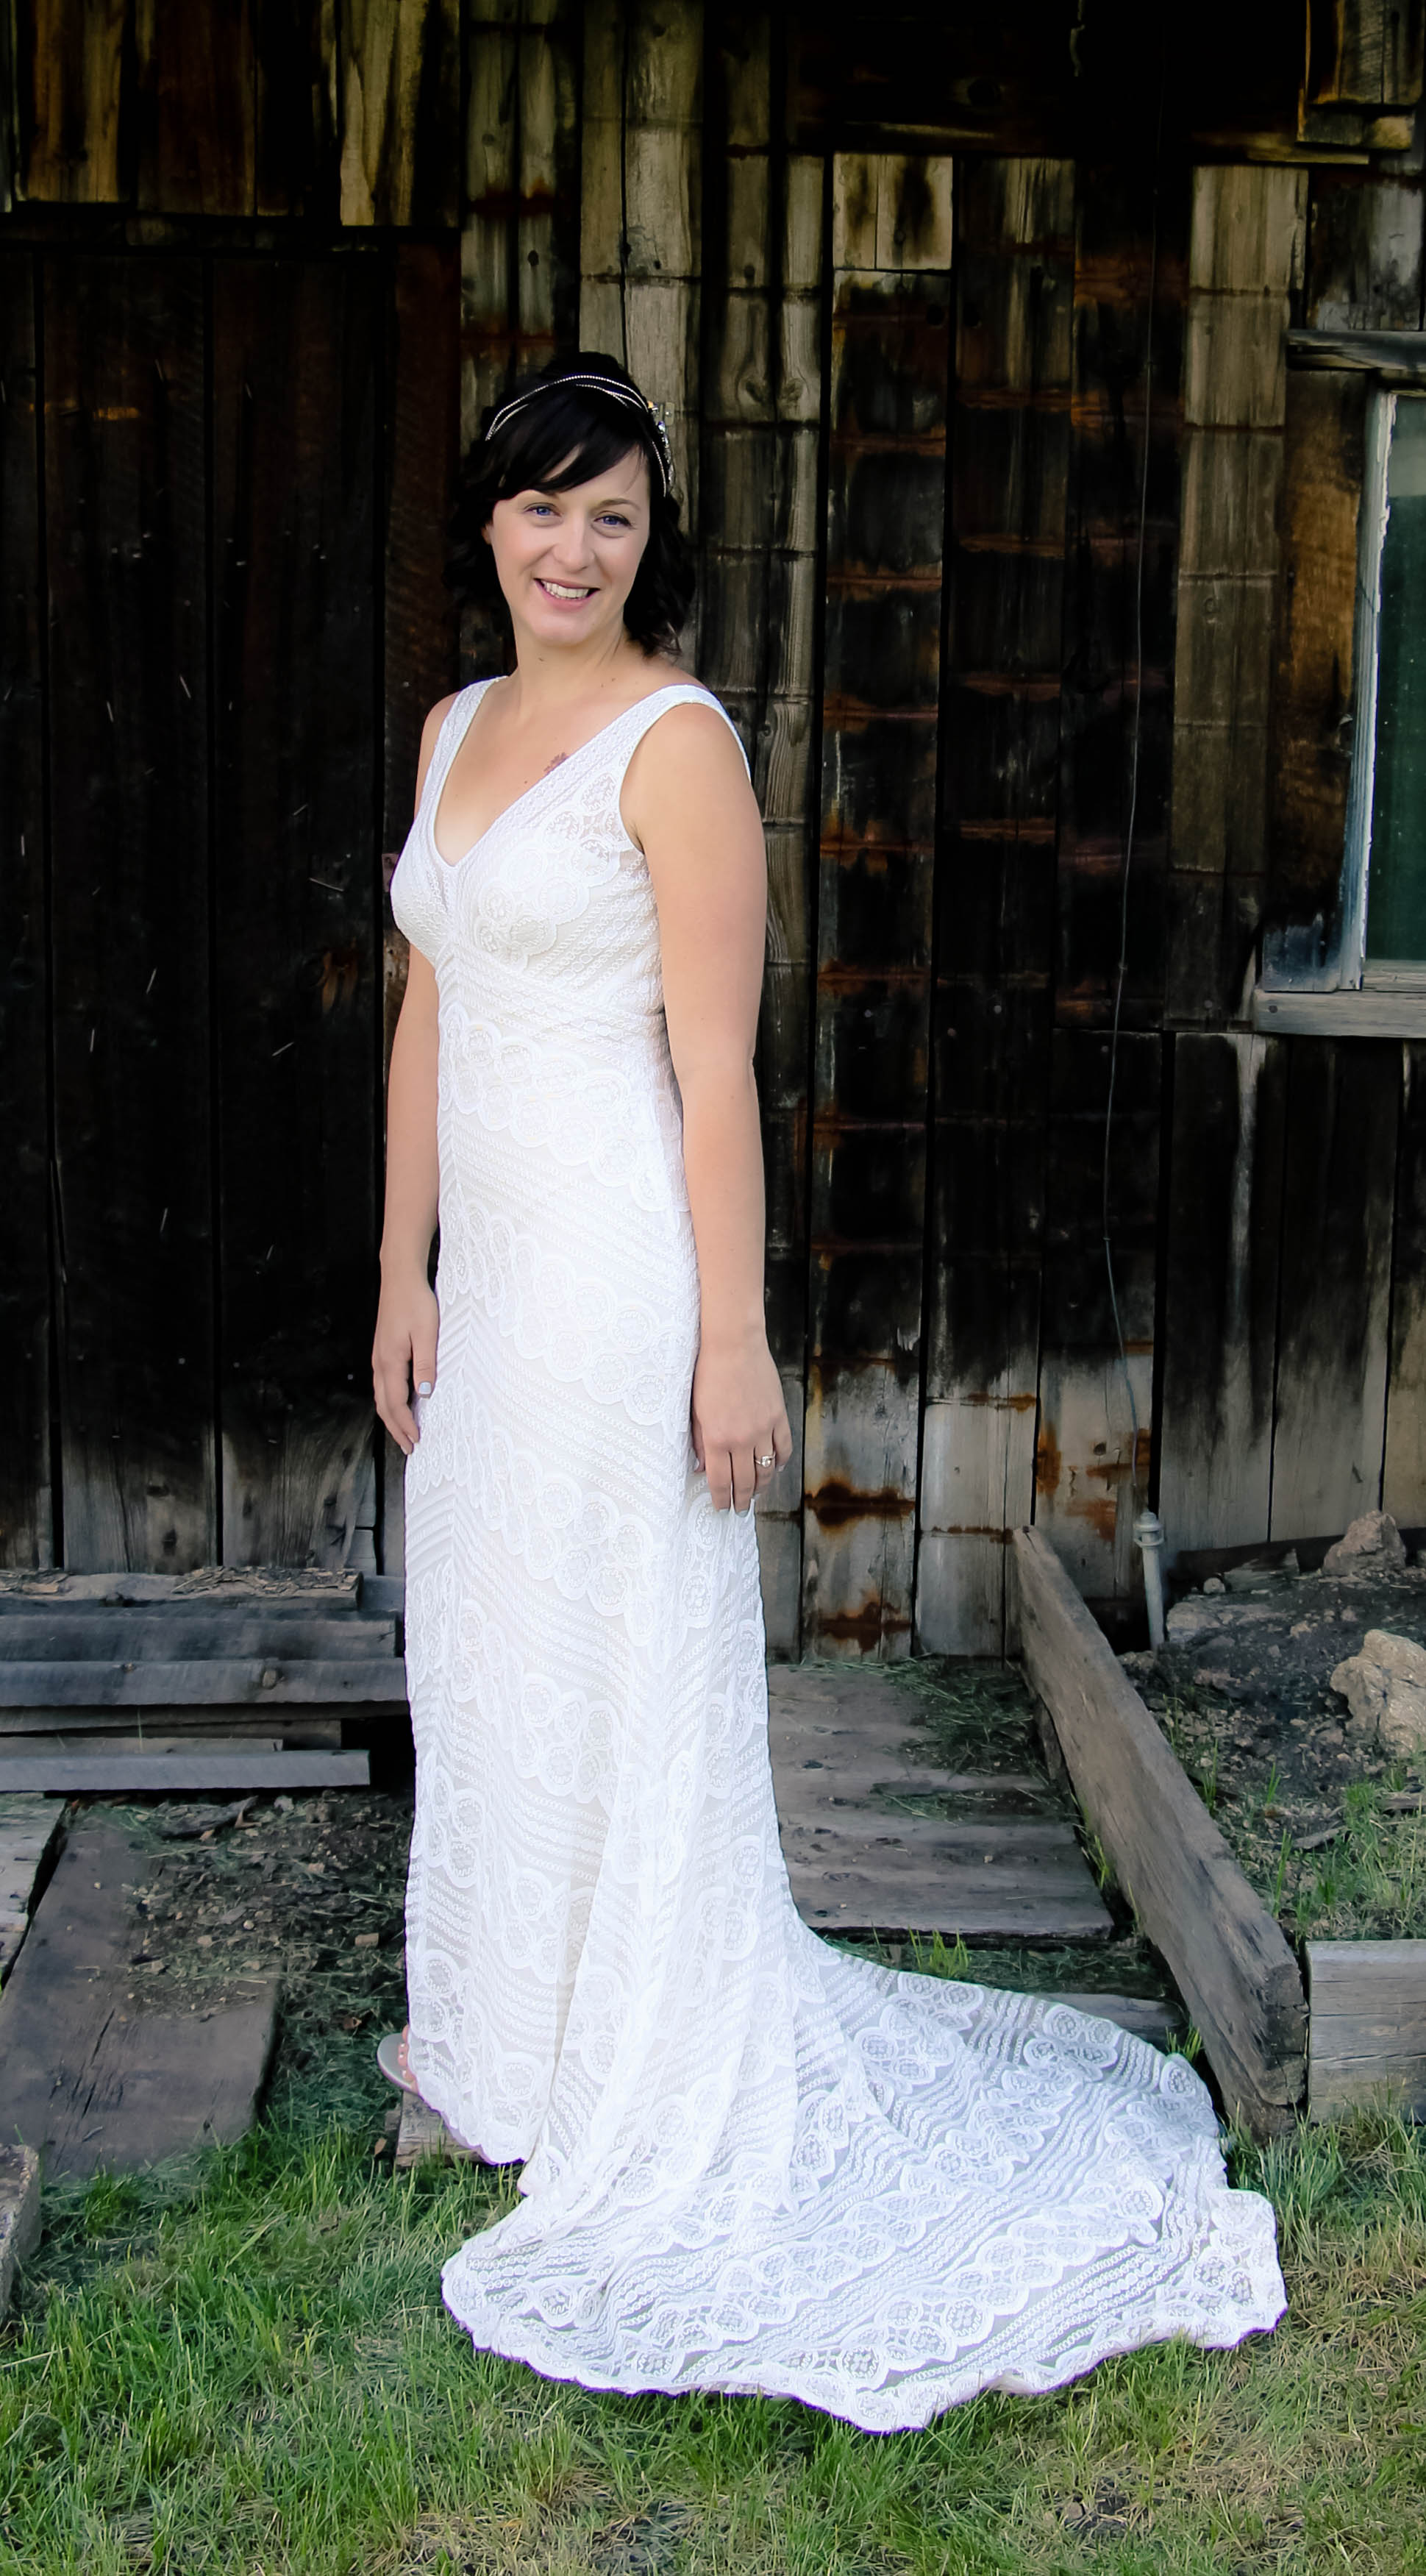 Kimberly_Eric_Mountain_Town_Wedding_1.jpg